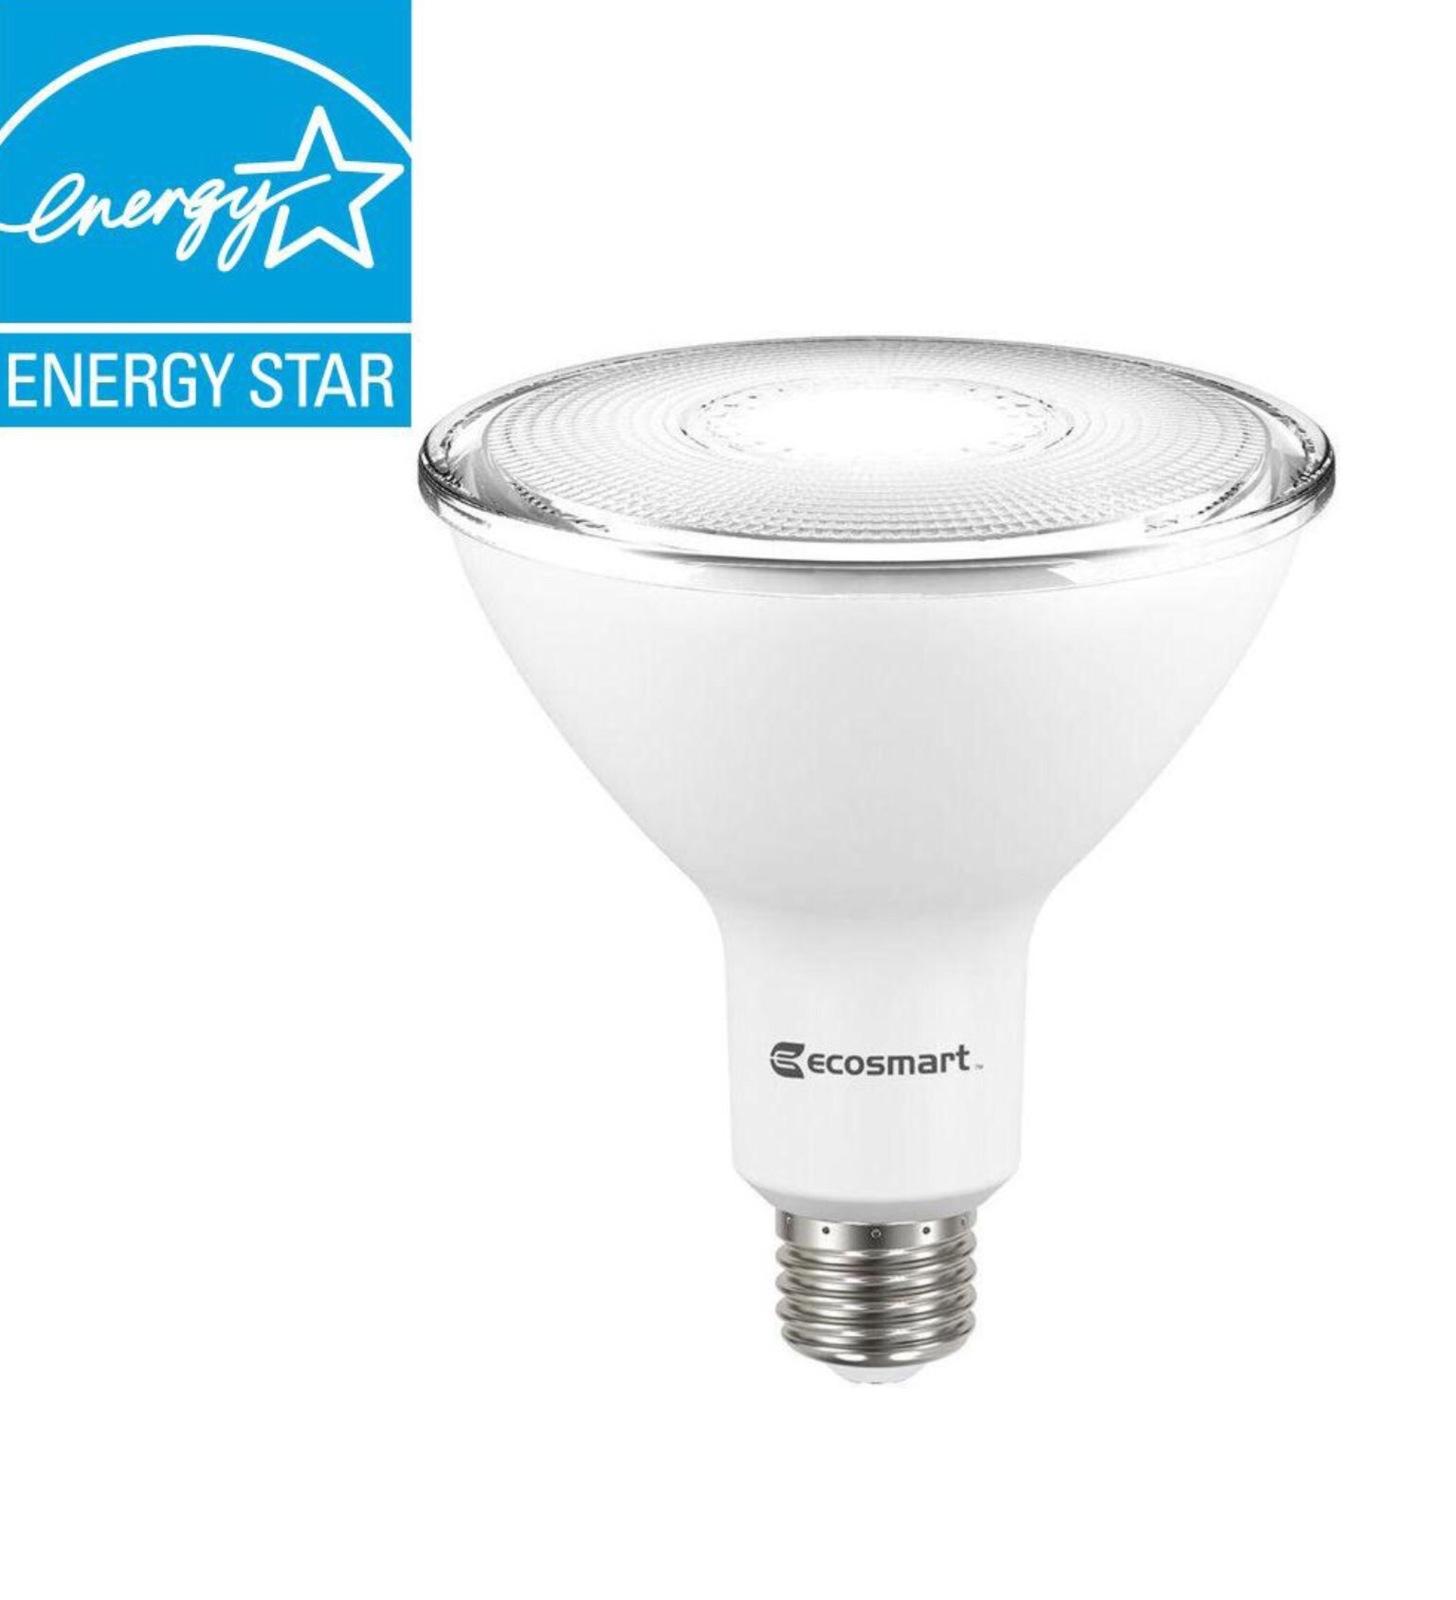 8 Bulbs EcoSmart LED 120W Equivalent Bright White PAR38 Dimmable Flood Light - $95.89